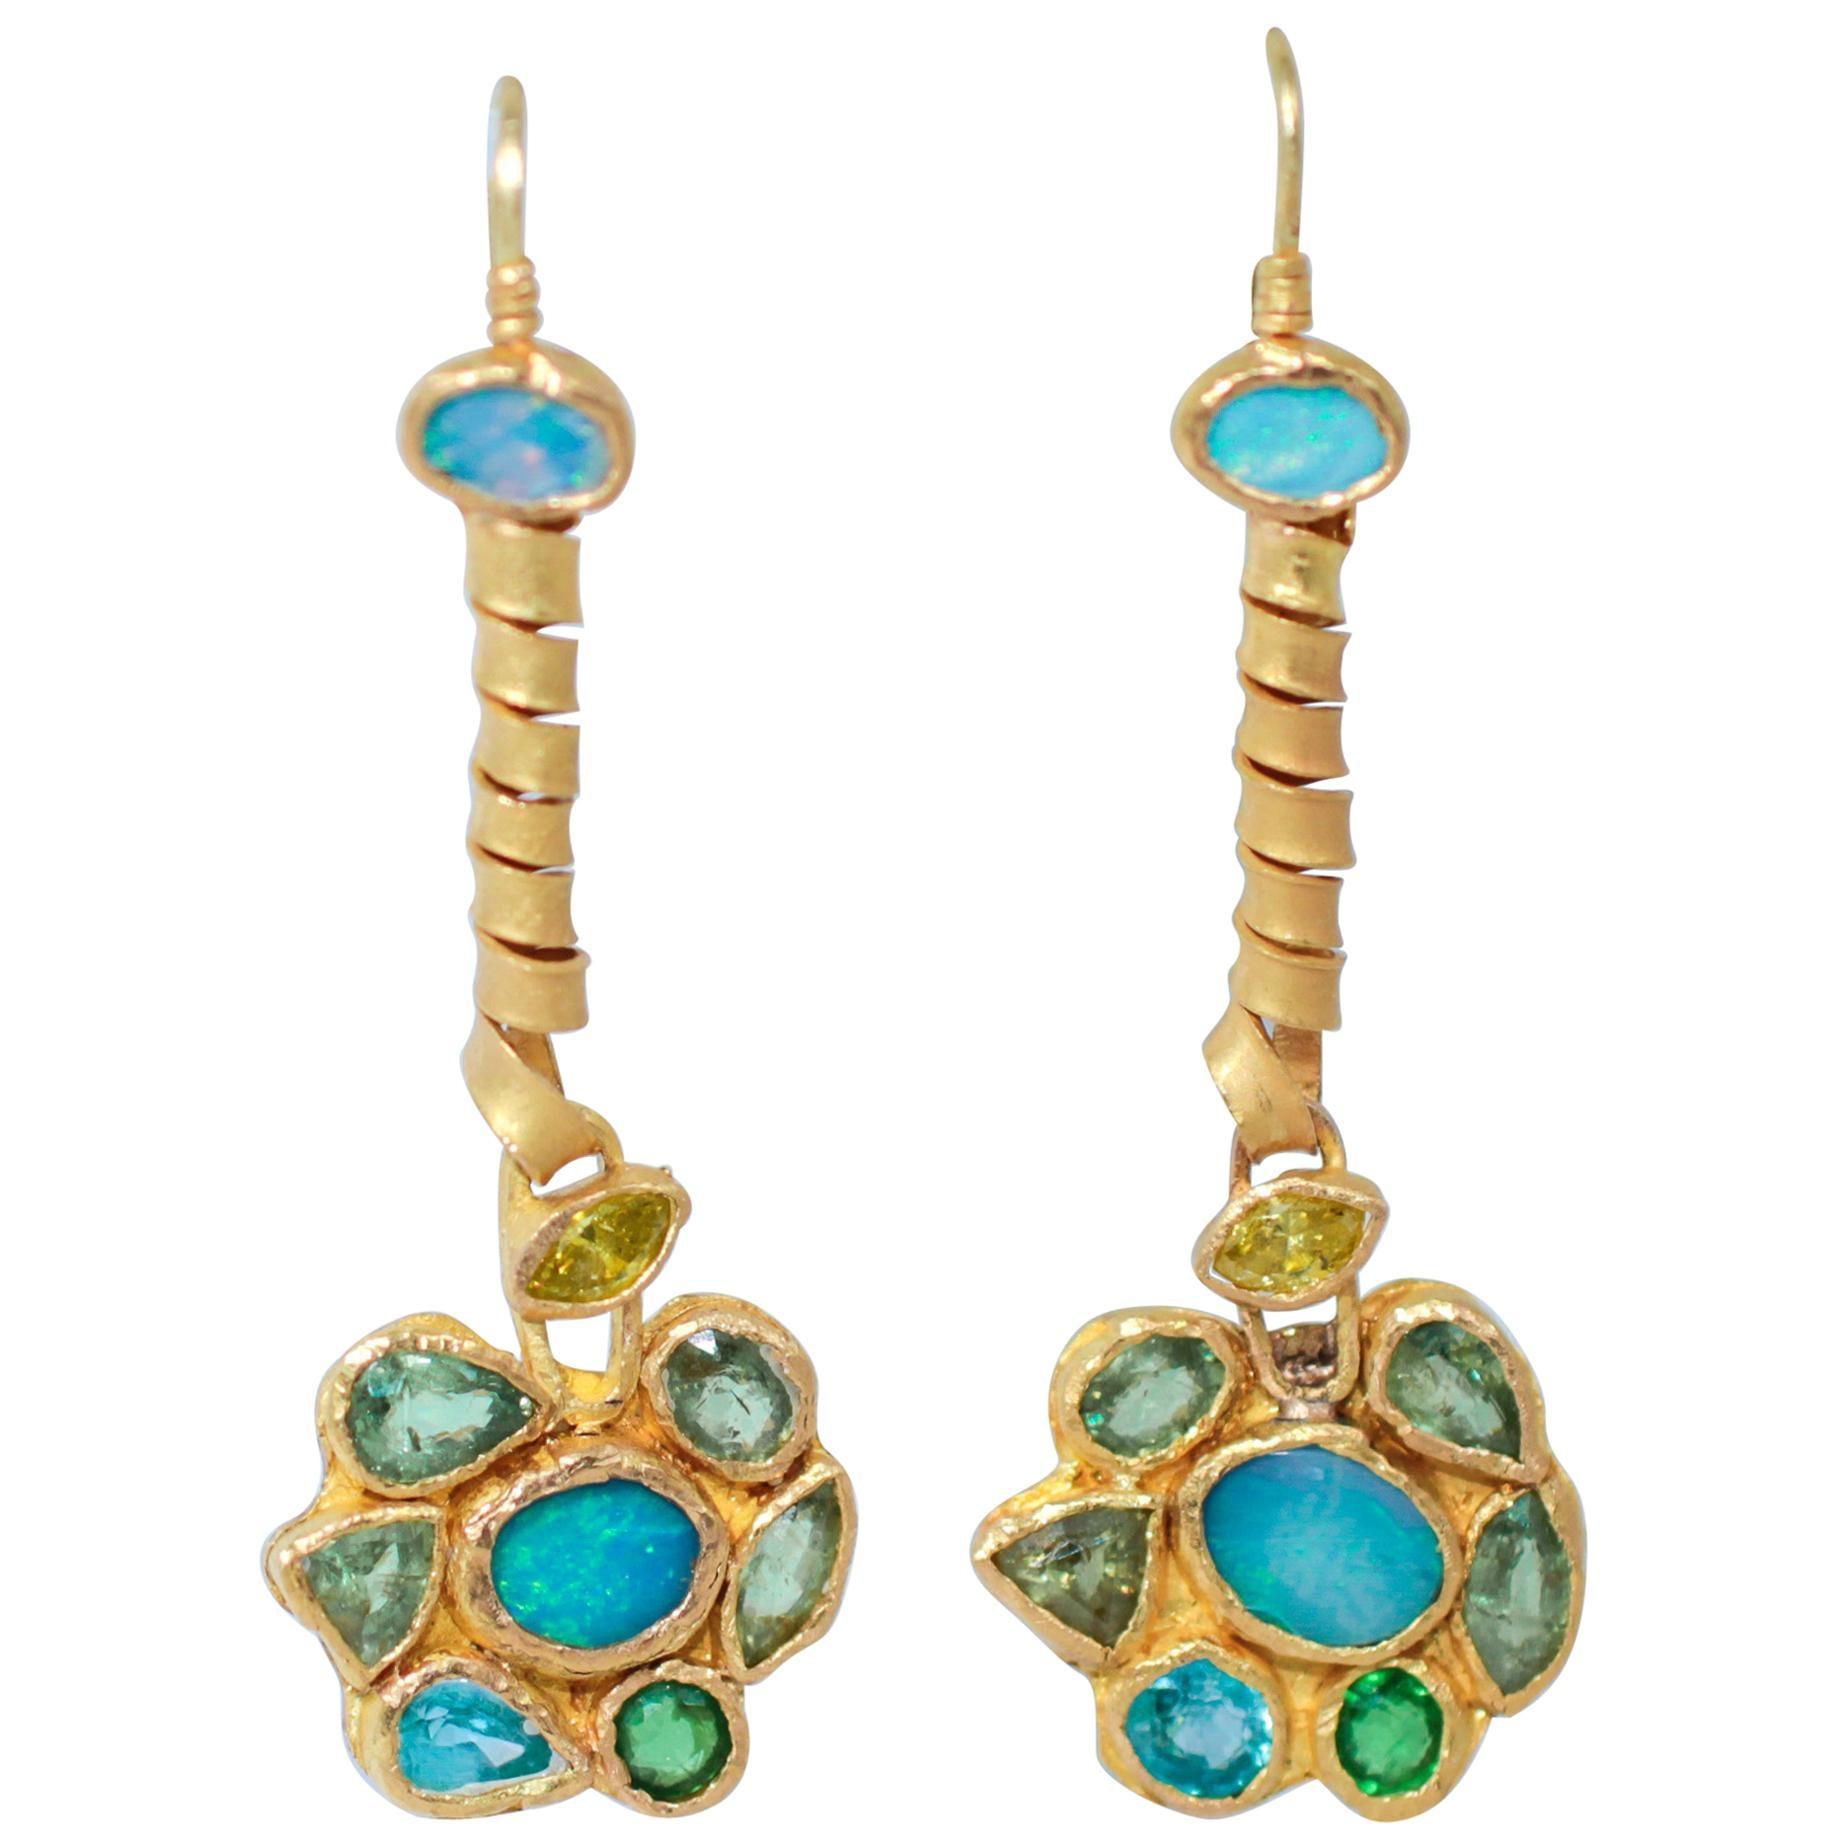 Opals Diamonds Demantoid Garnets 22-21 Karat Gold Dangle Drop Organic Earrings